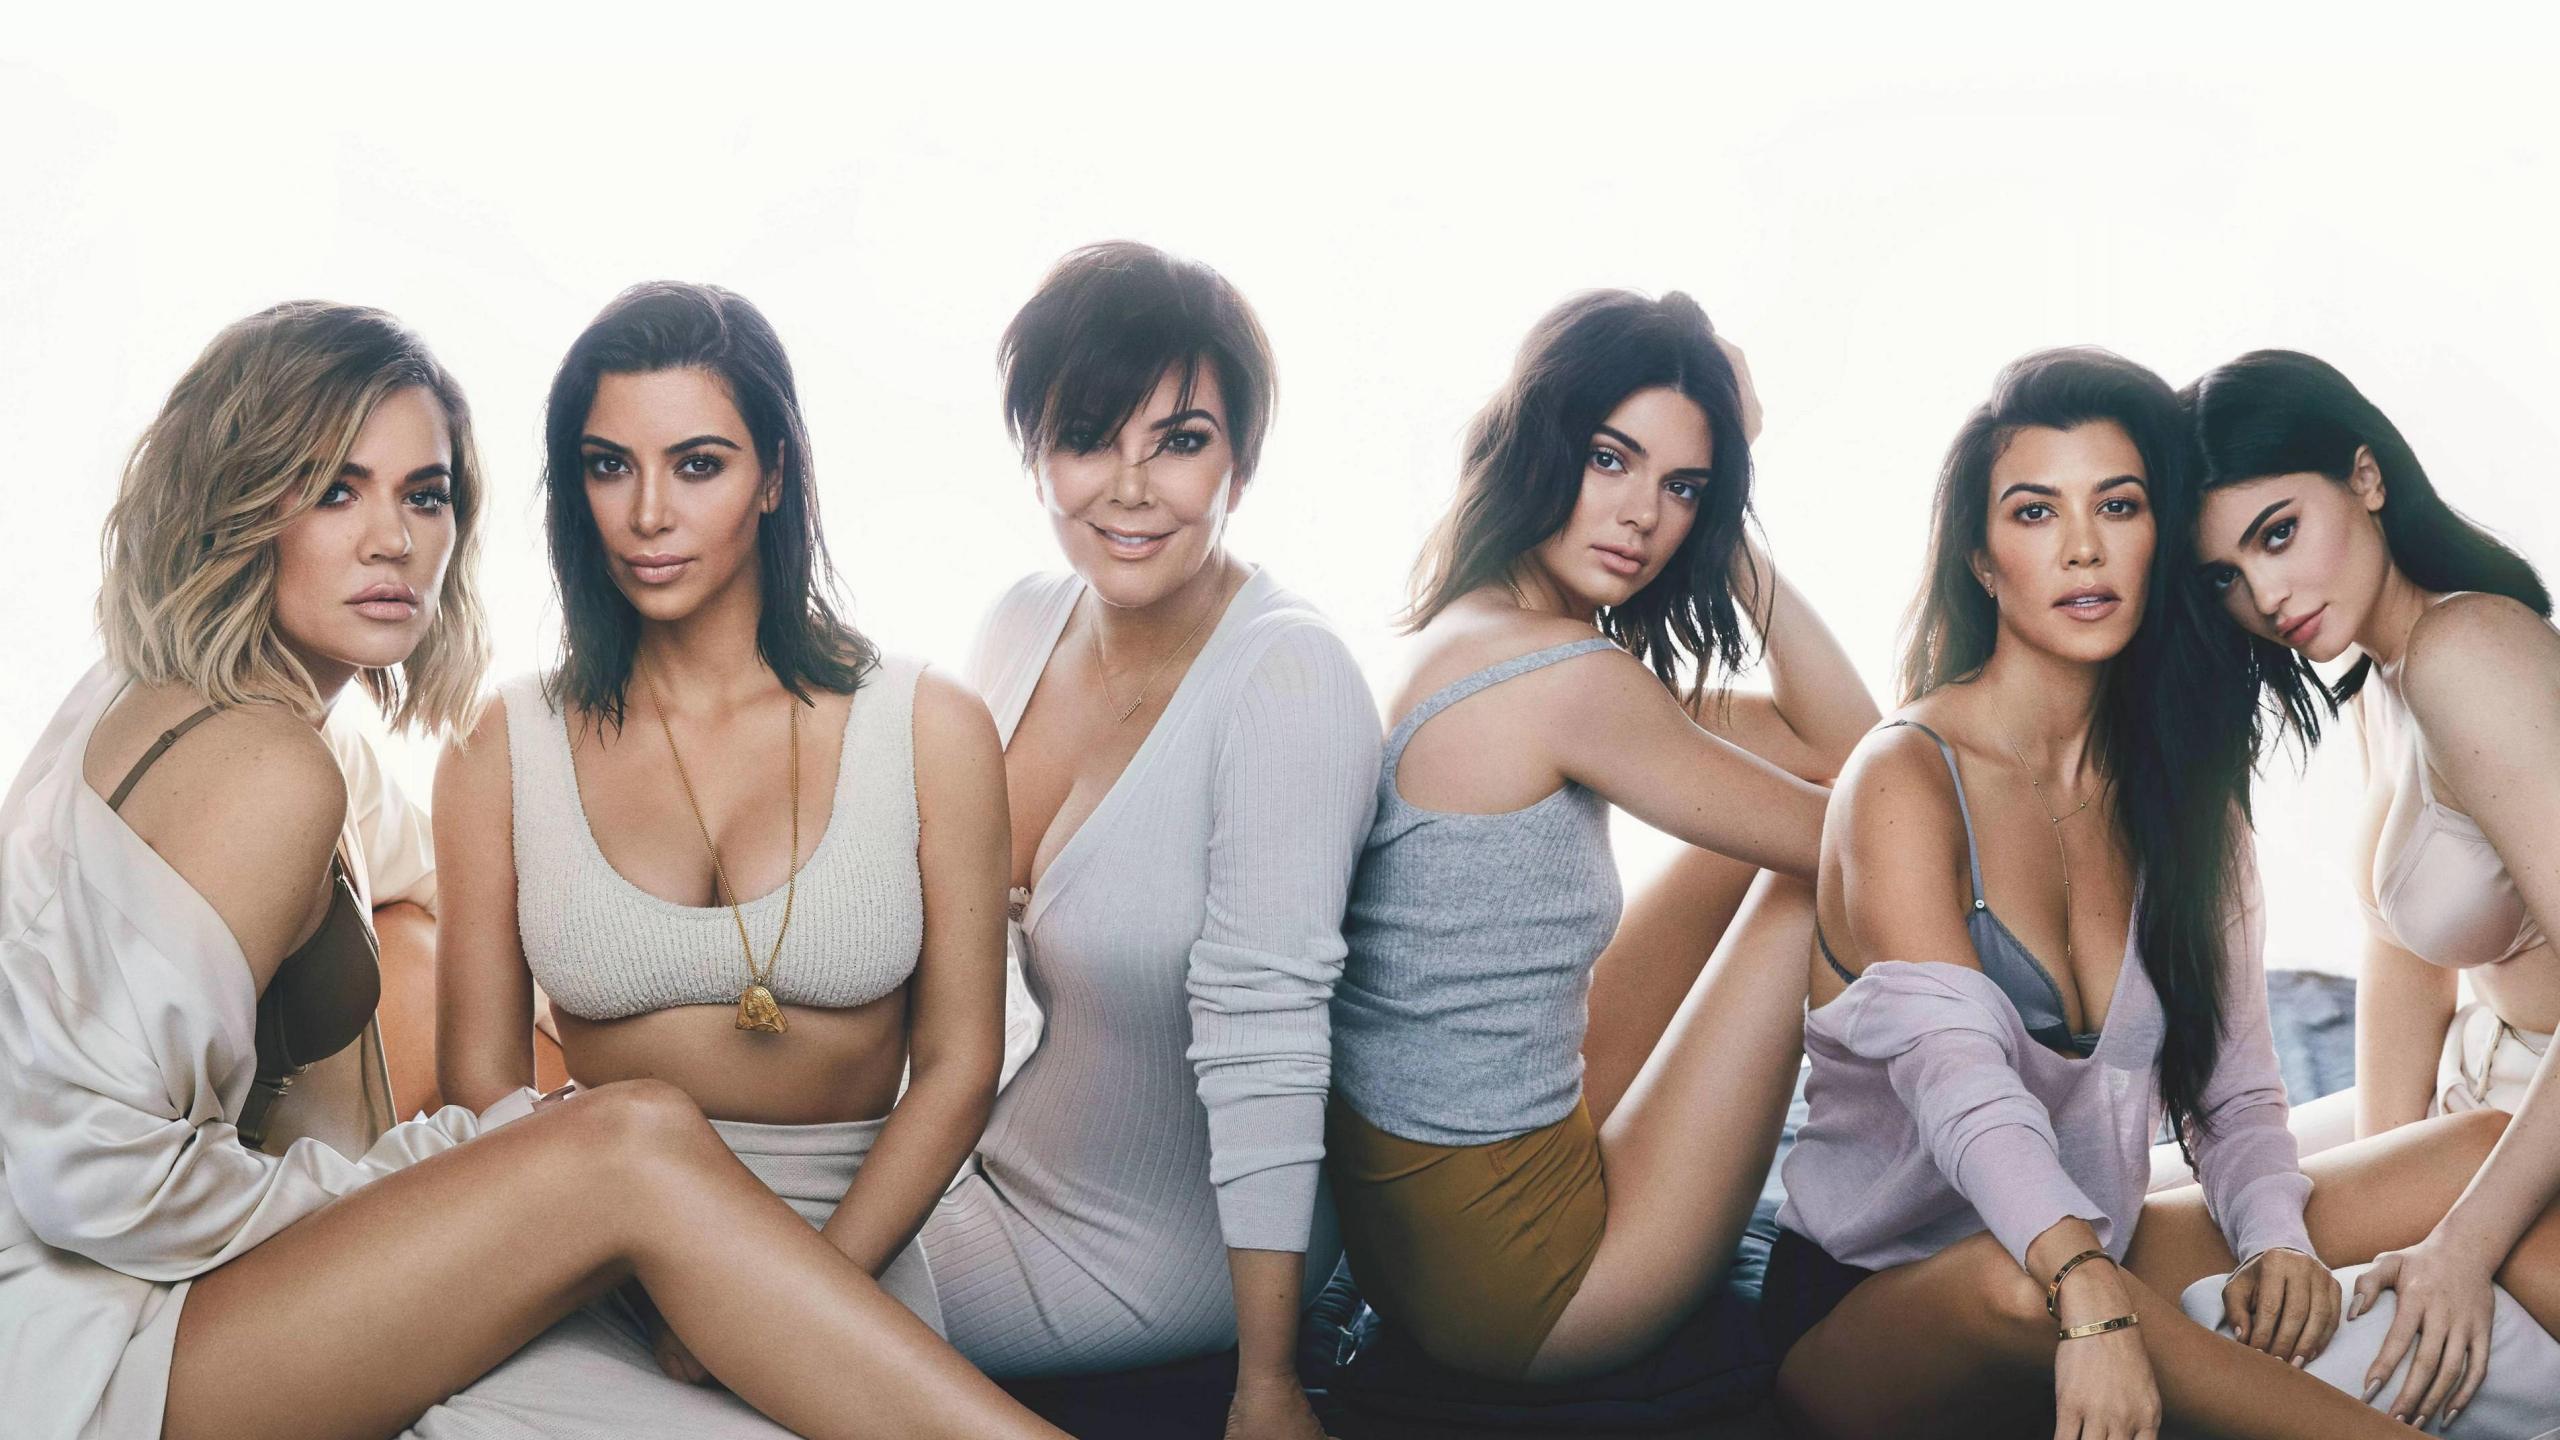 Download Keeping Up With The Kardashians Season 14 2018 ...